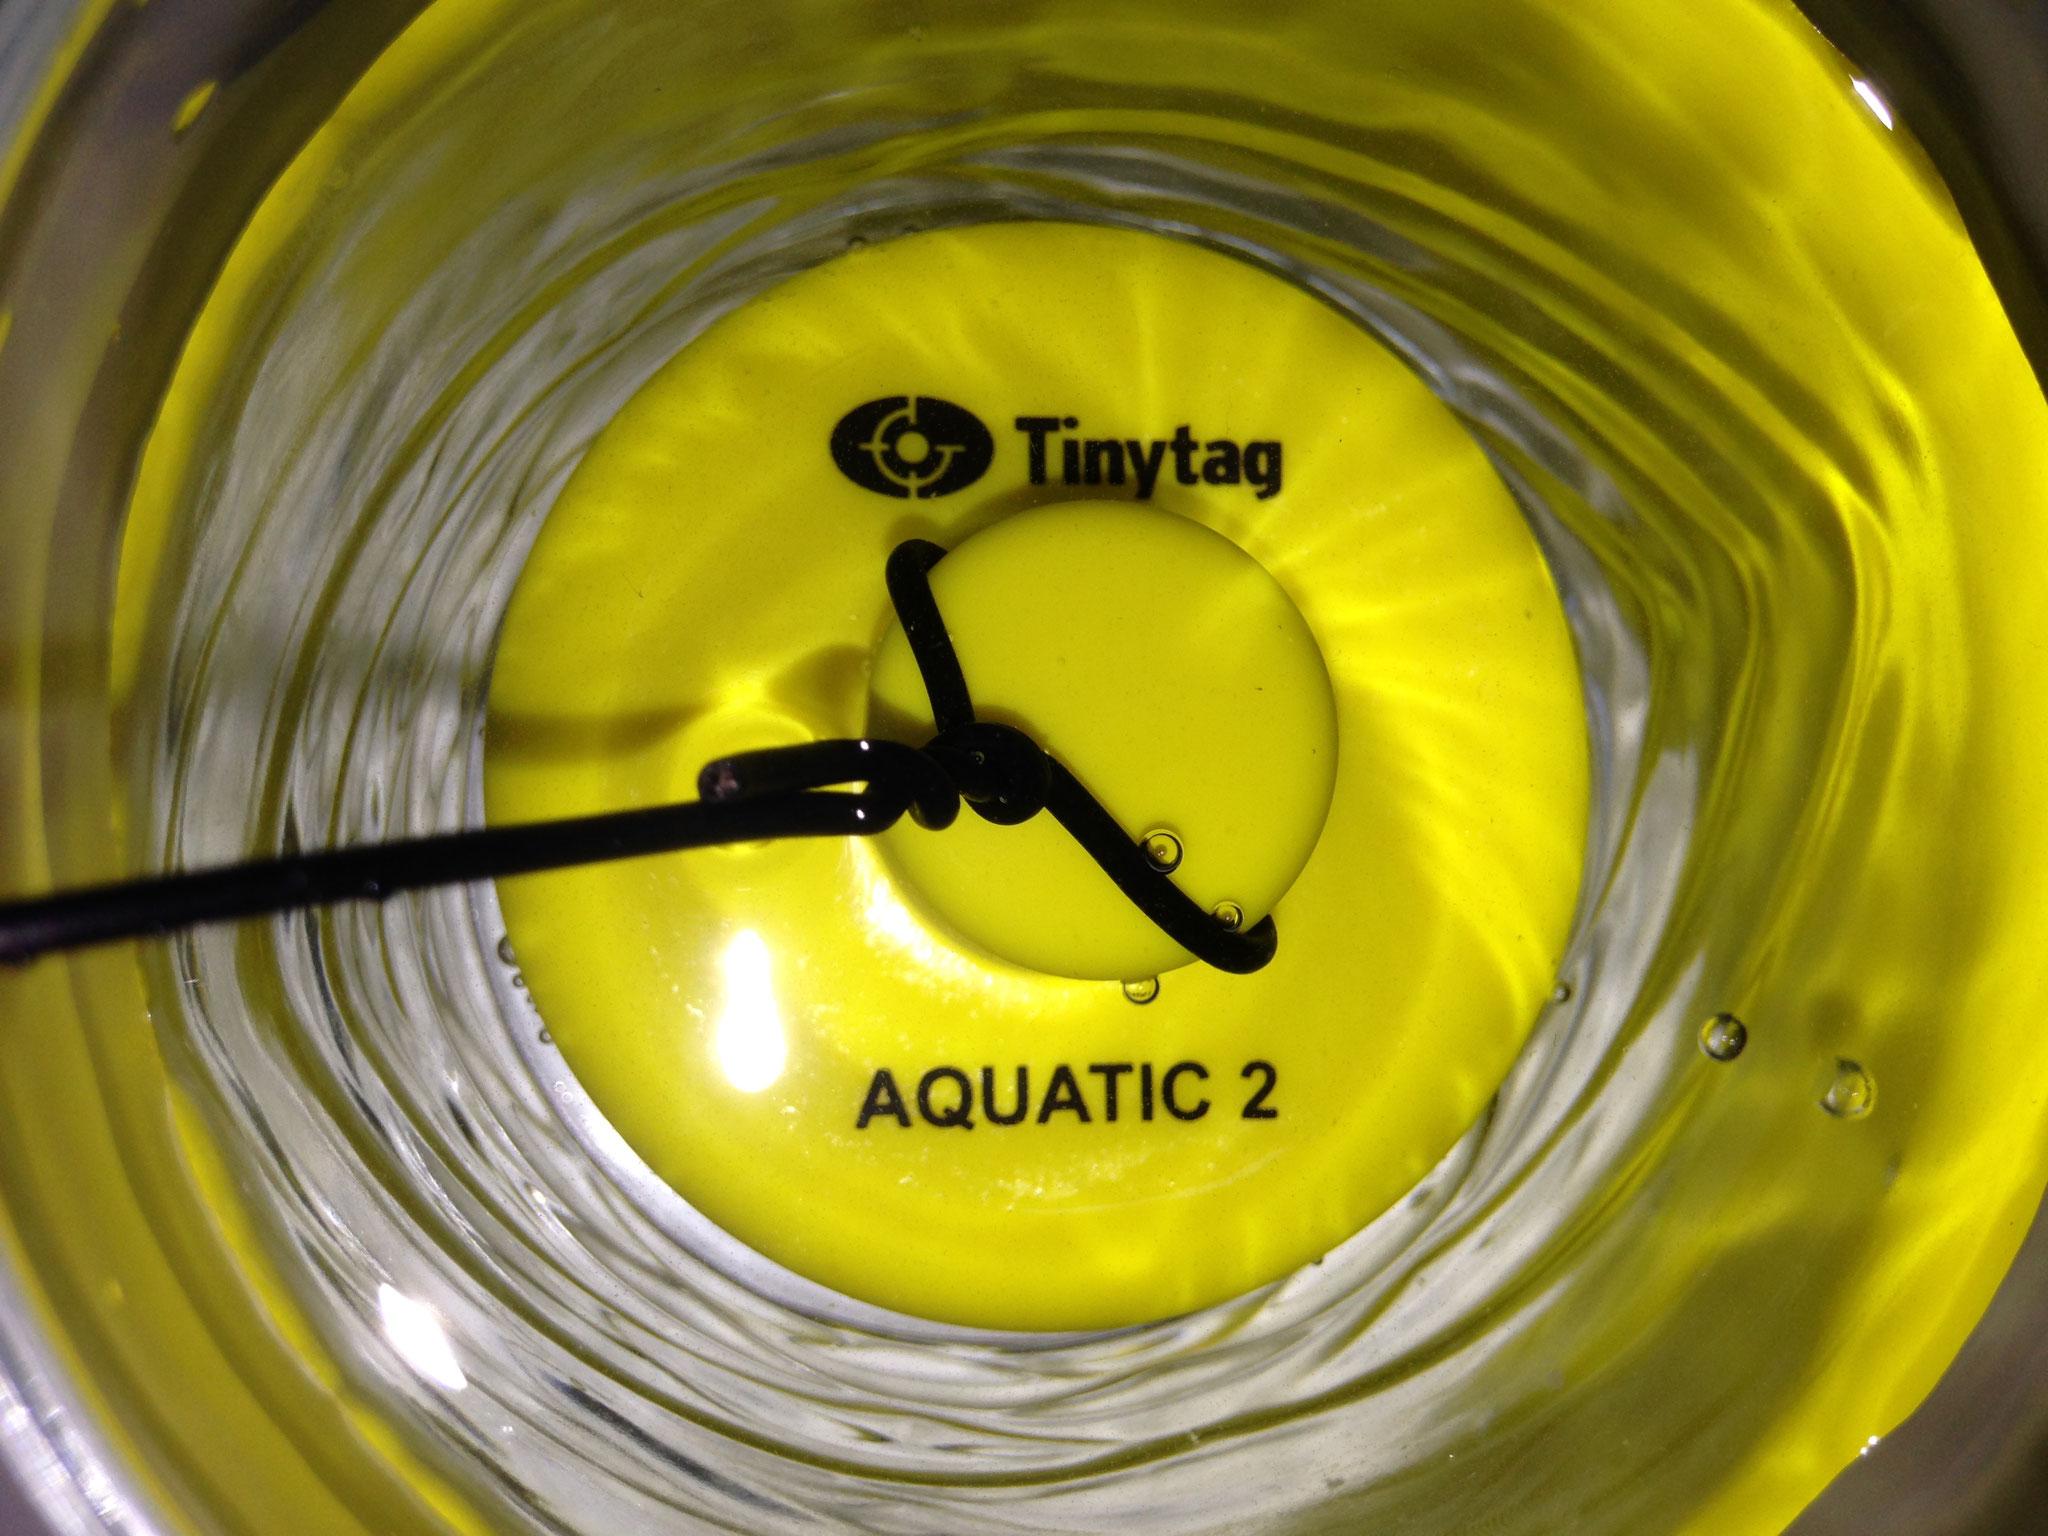 Tinytag Aquatic 2 étanche autonome et robuste